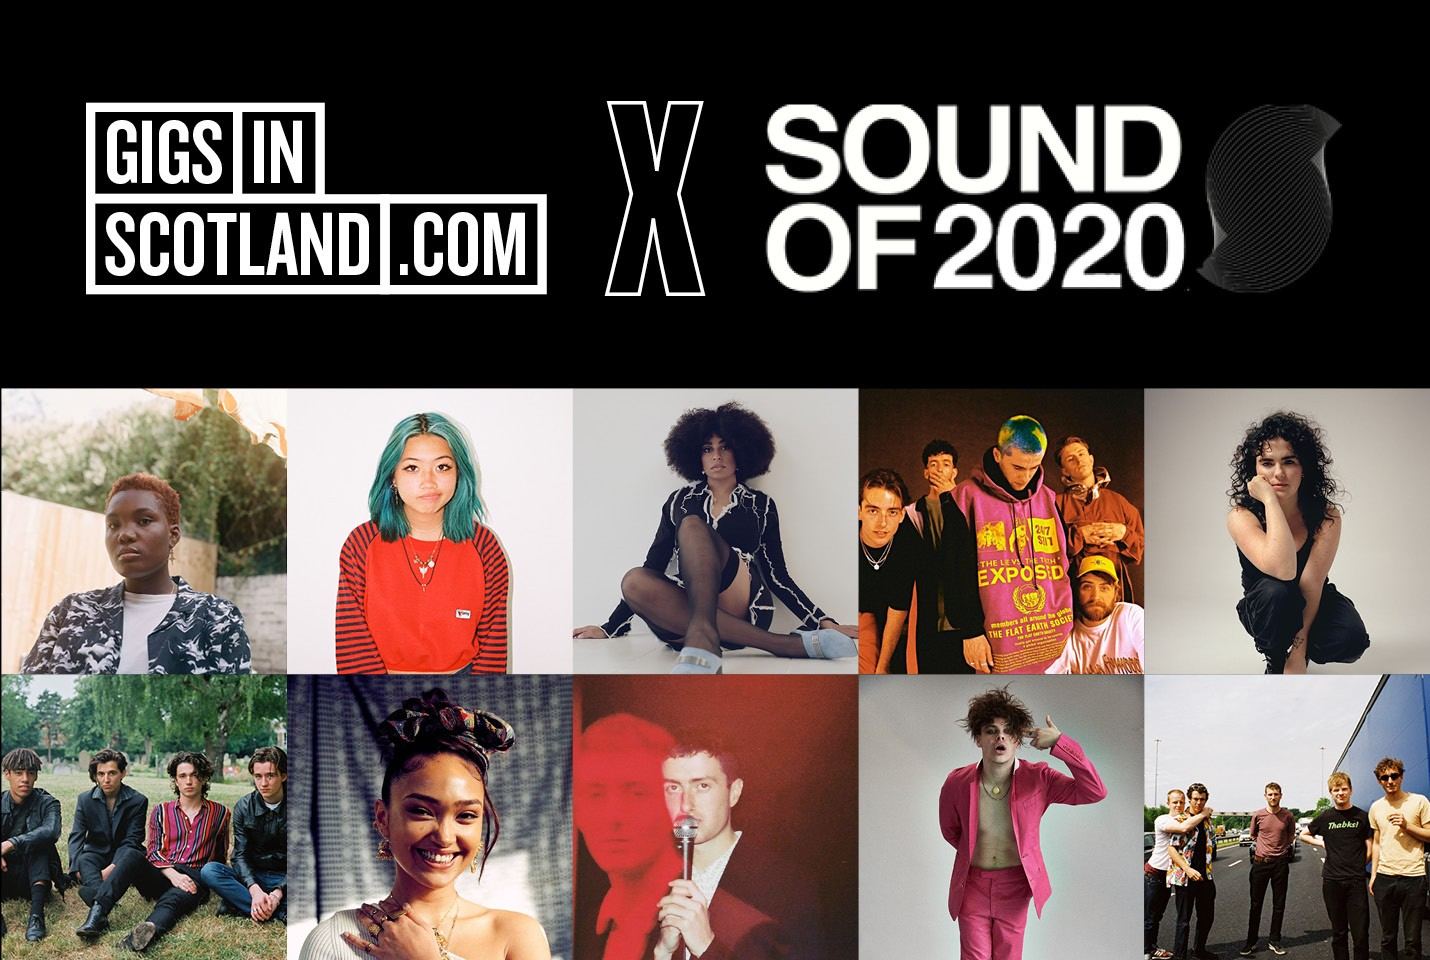 BBC Sound Of 2020 Gigs in Scotland